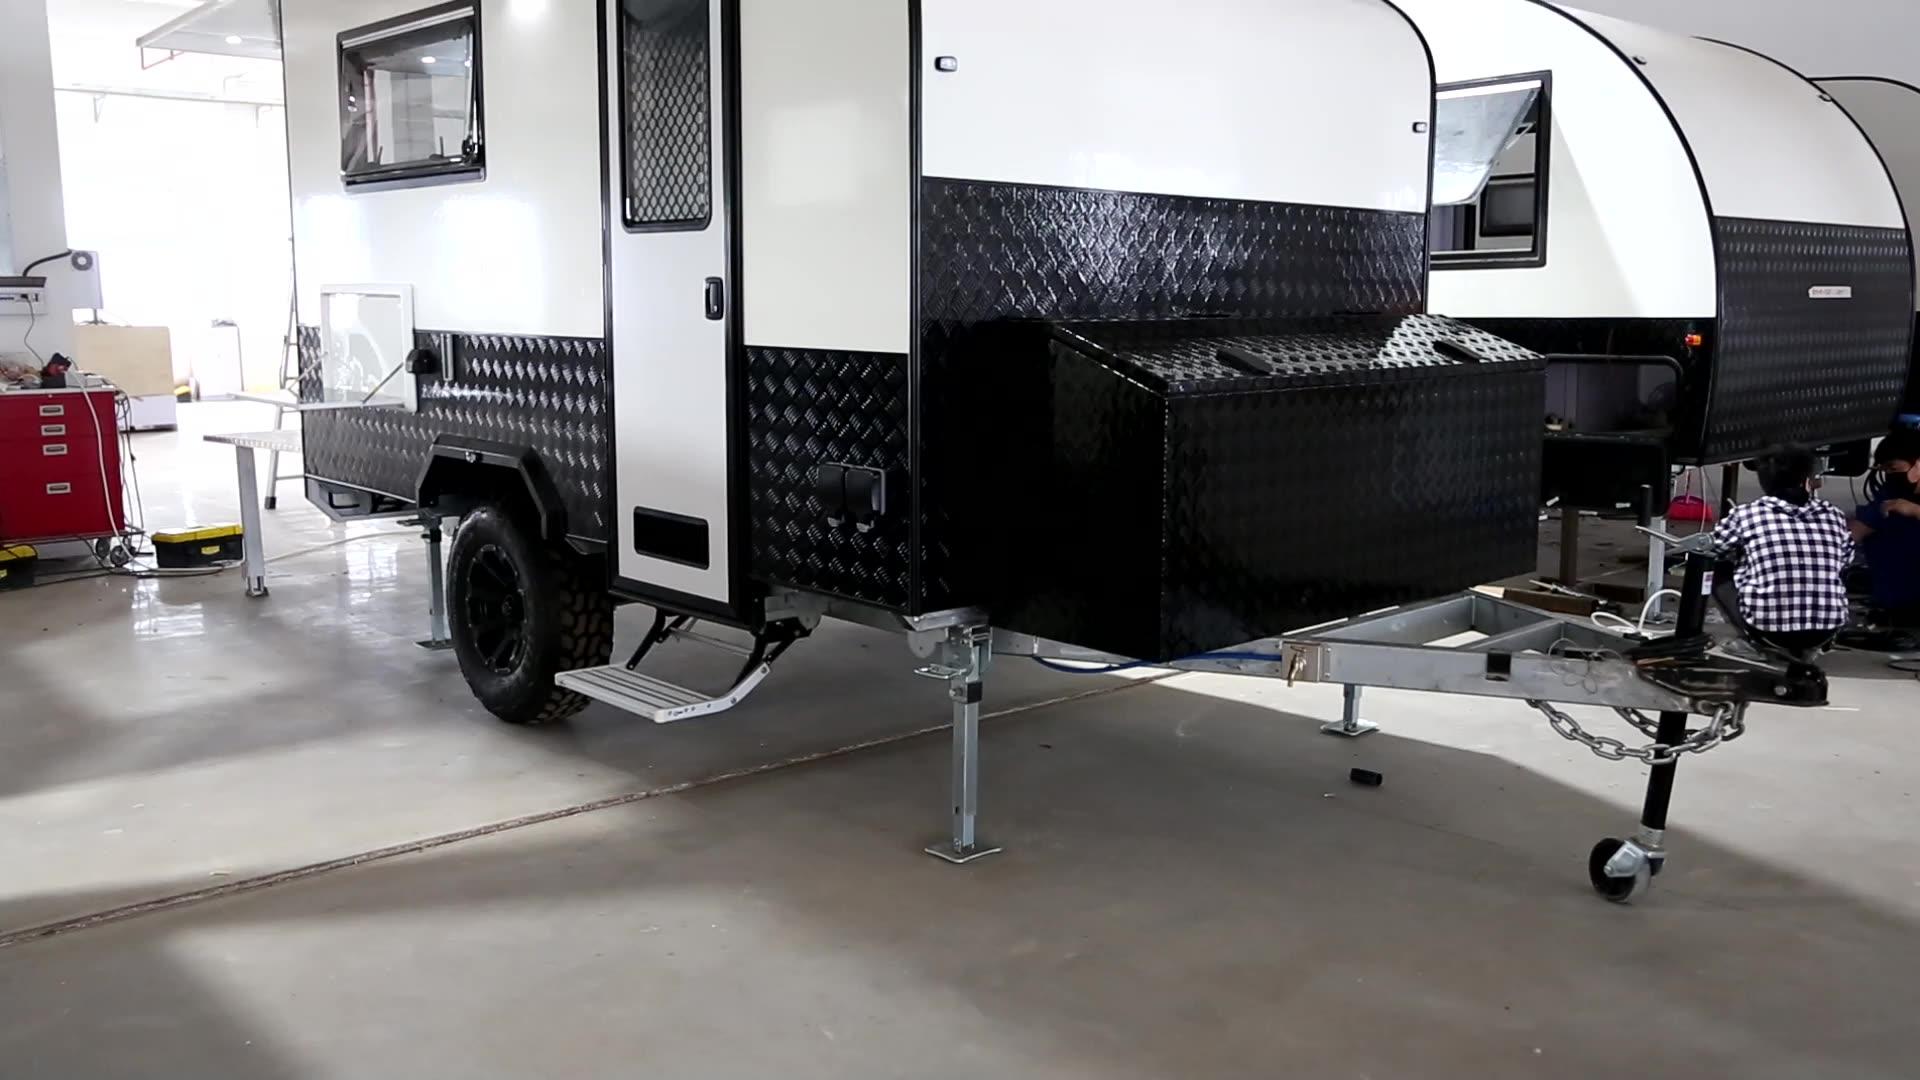 Best Small Bunk Bed Camper Rv Toy Hauler Travel Trailer ...